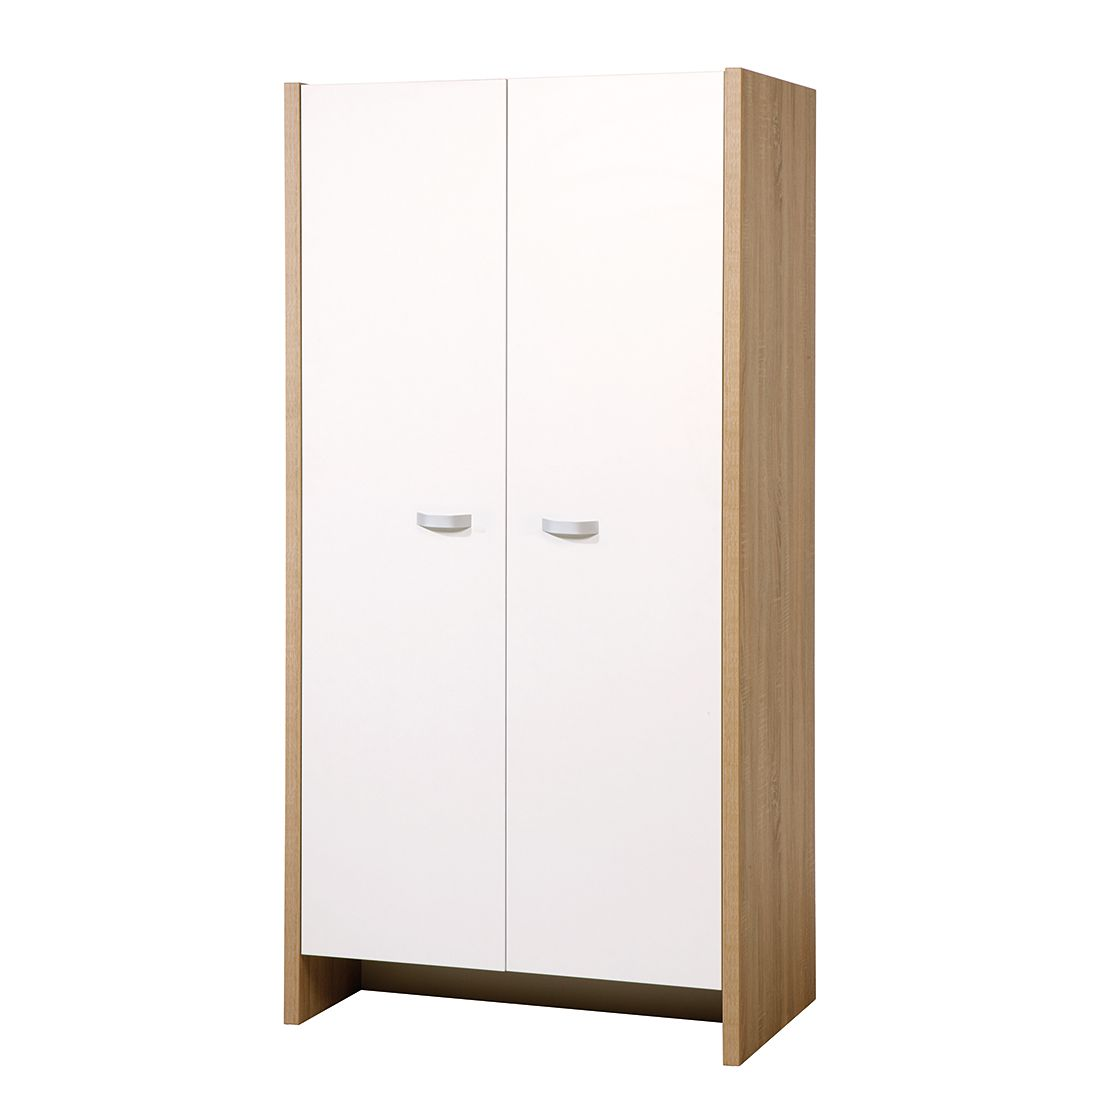 Armoire à vêtements Ancona II - Imitation chêne brut de sciage / Blanc, Roba